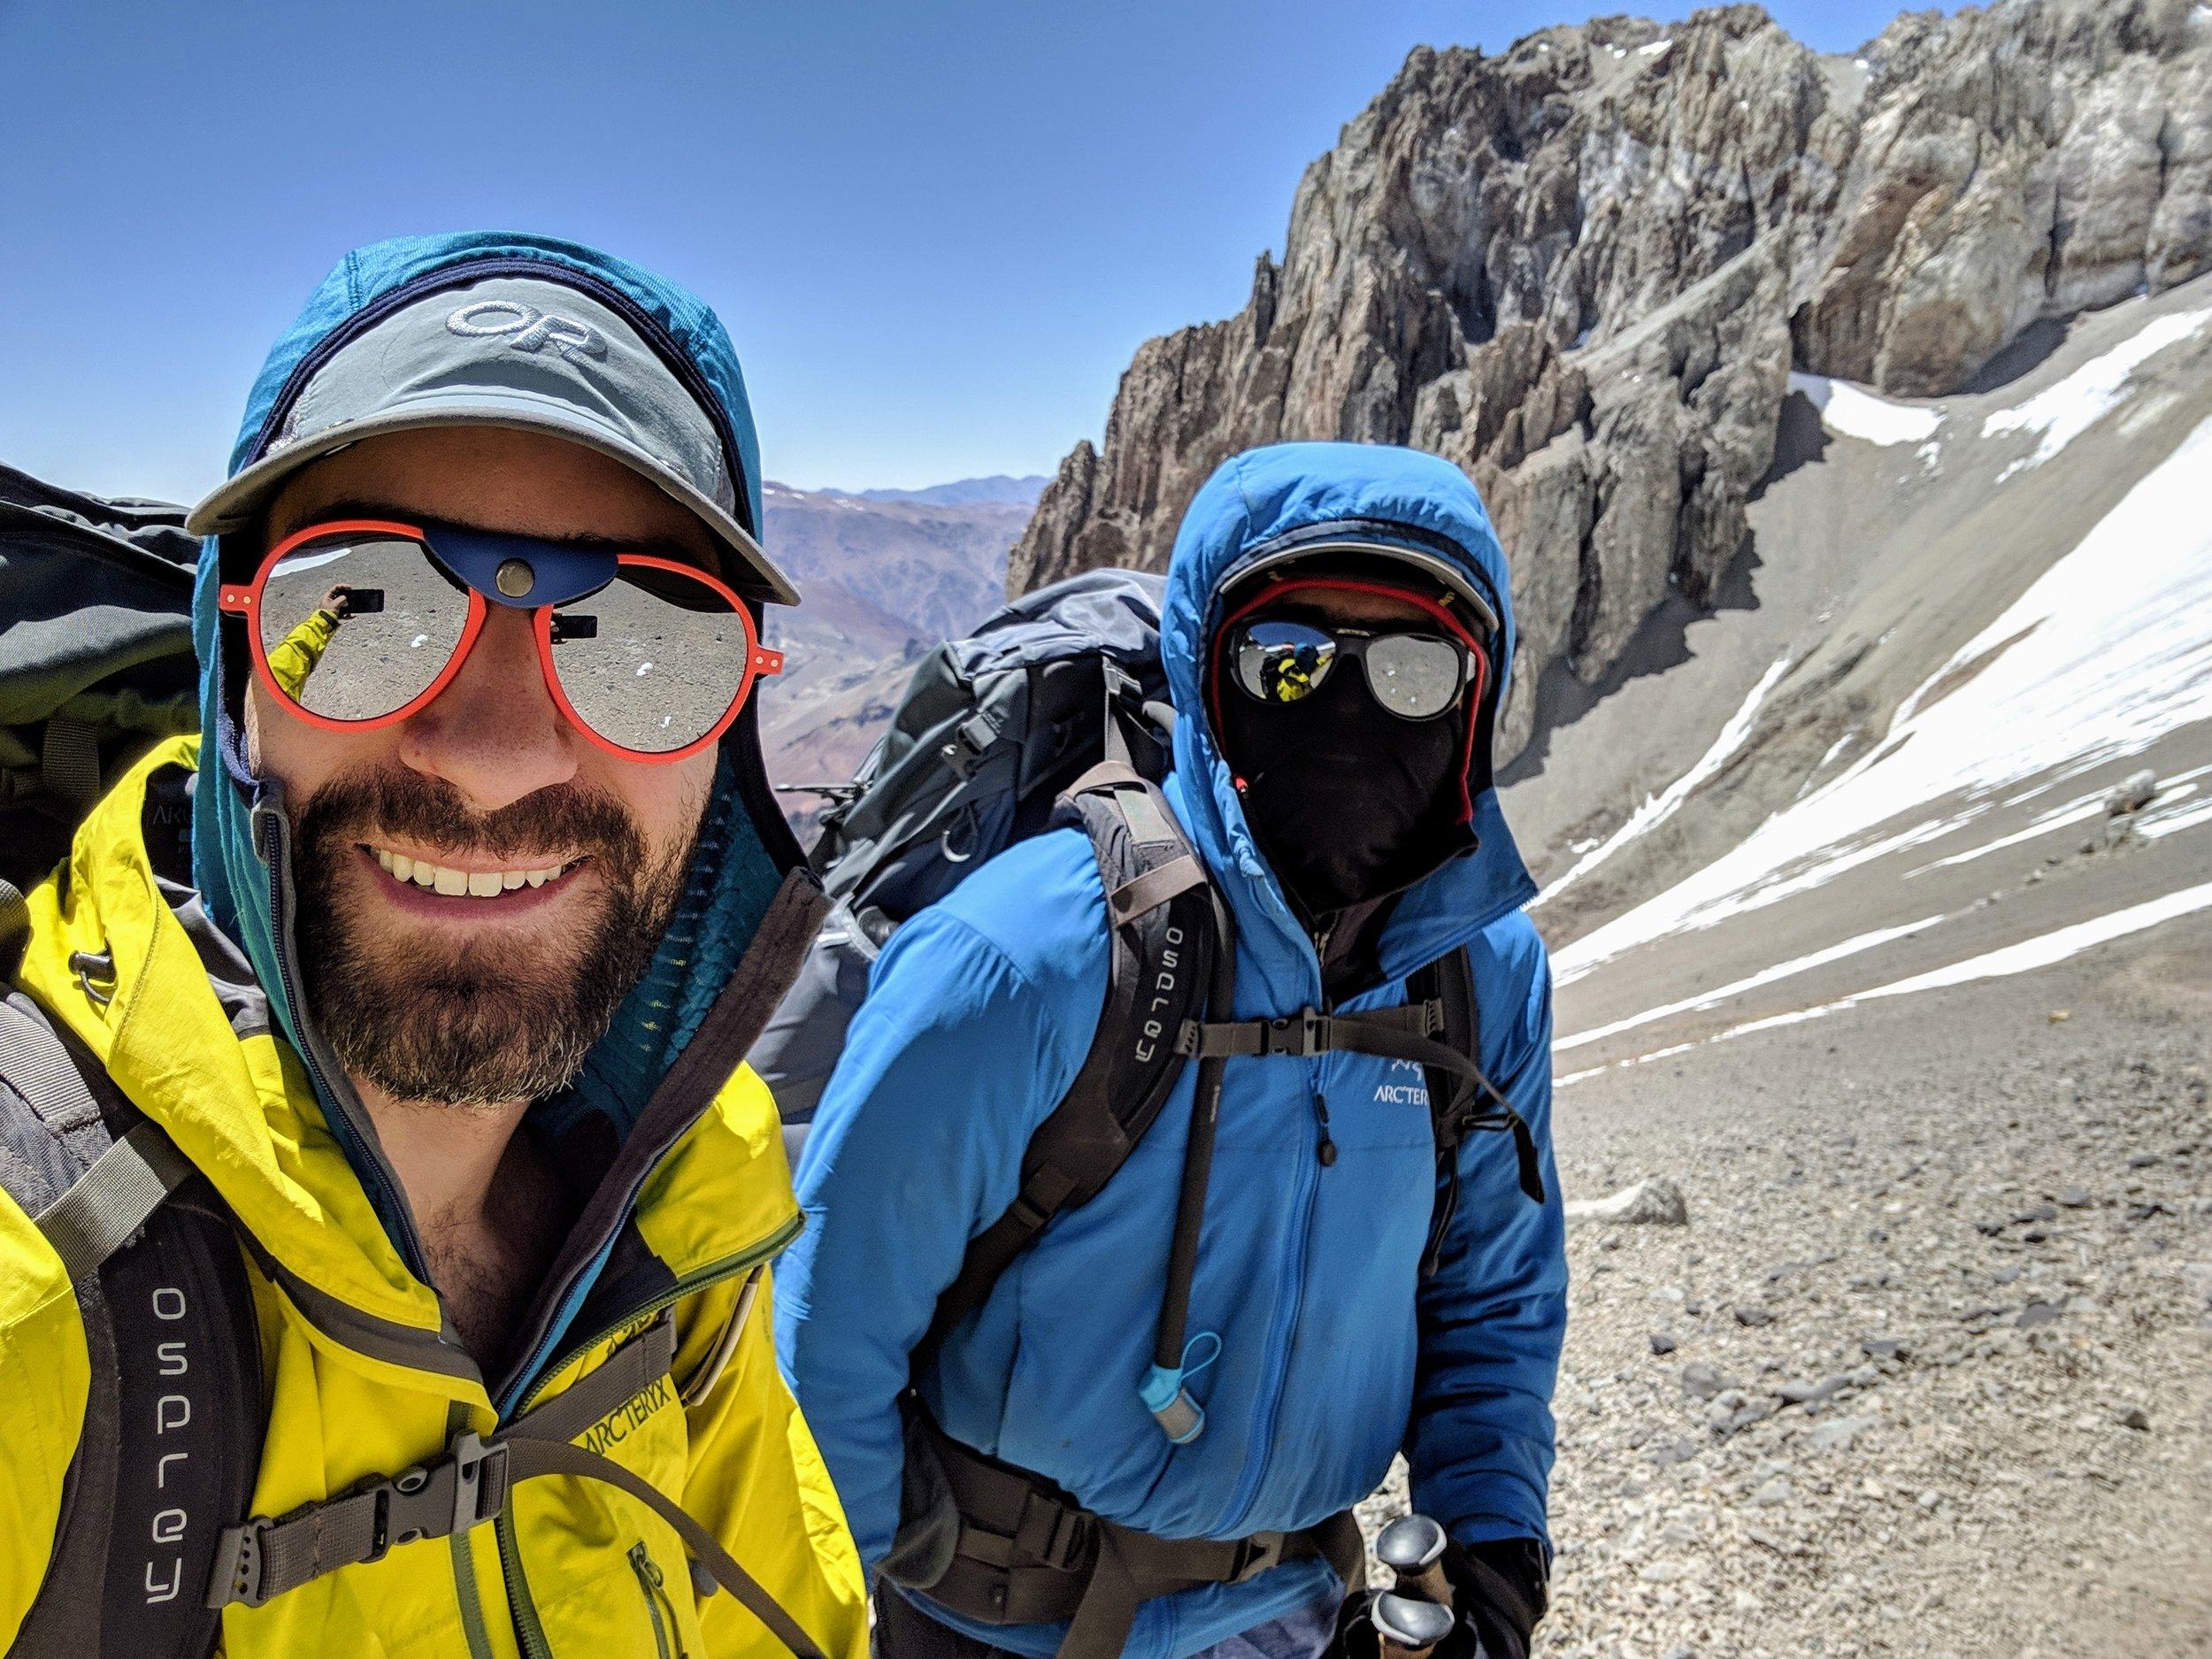 Acon-hike-to-camp-2 (1).jpg